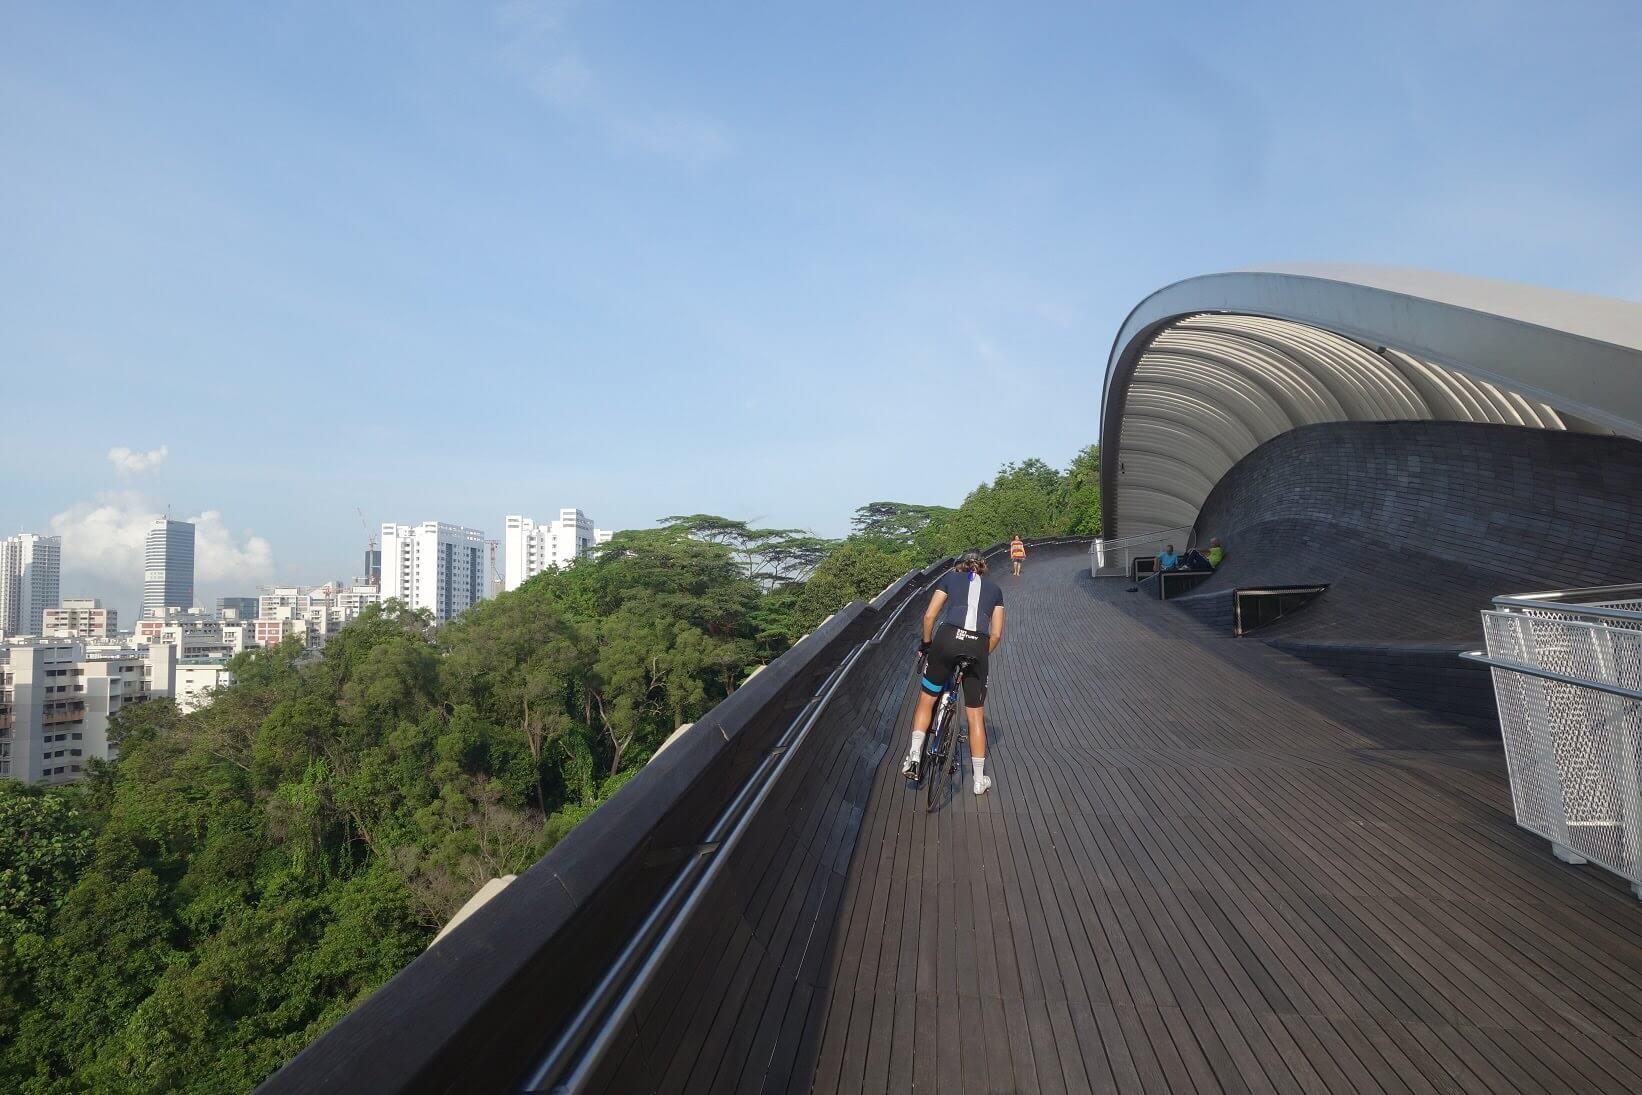 Delightful Singapore